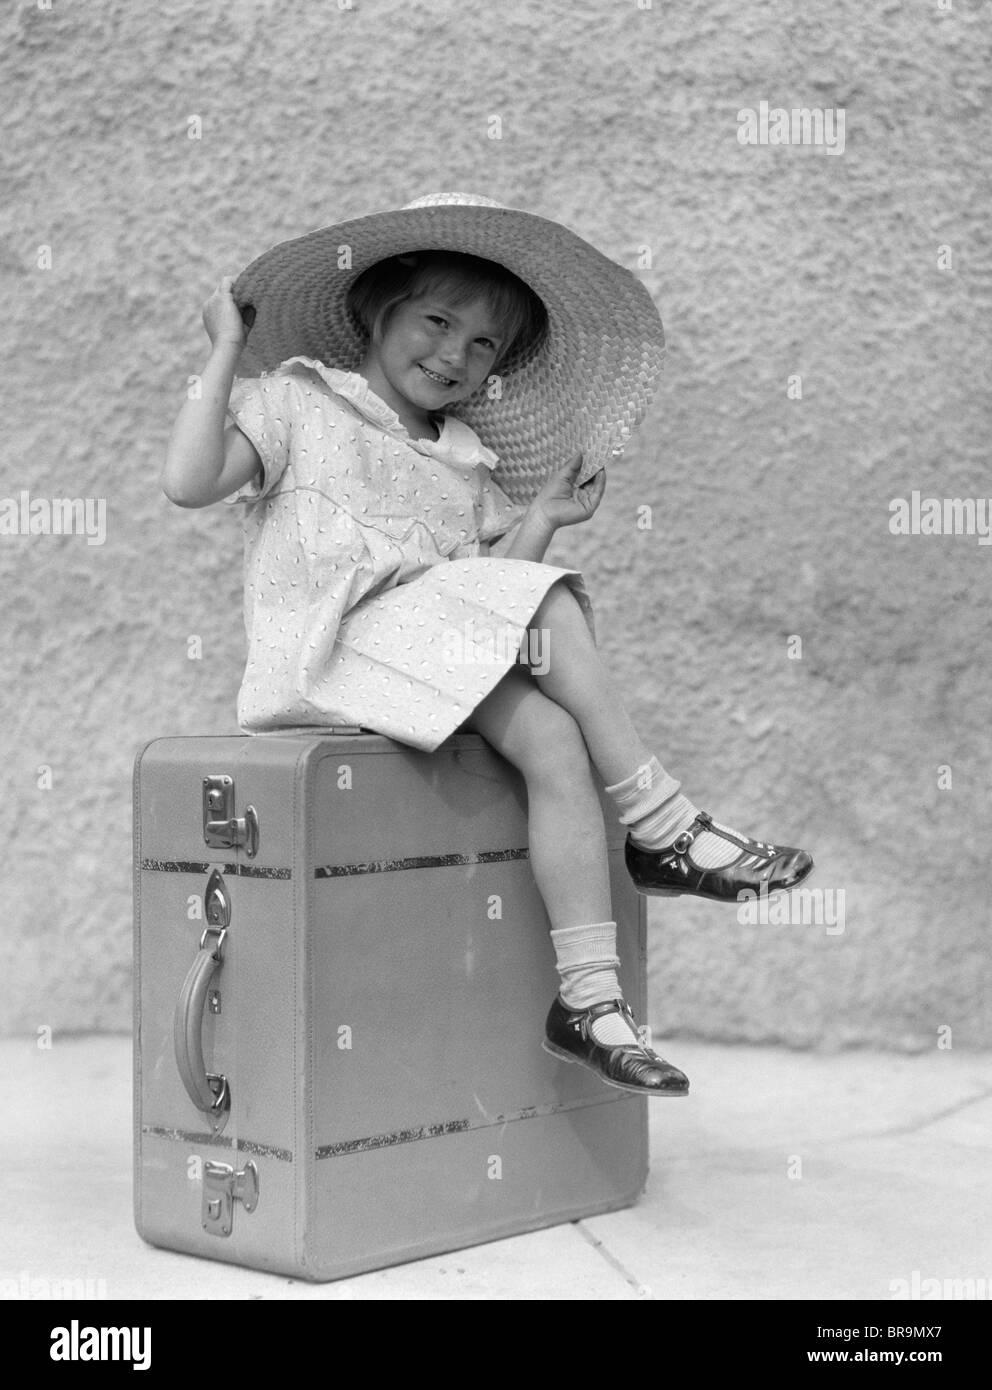 1930 Retrato sonriente niña sentada en maleta llevar sombrero de paja grande Imagen De Stock